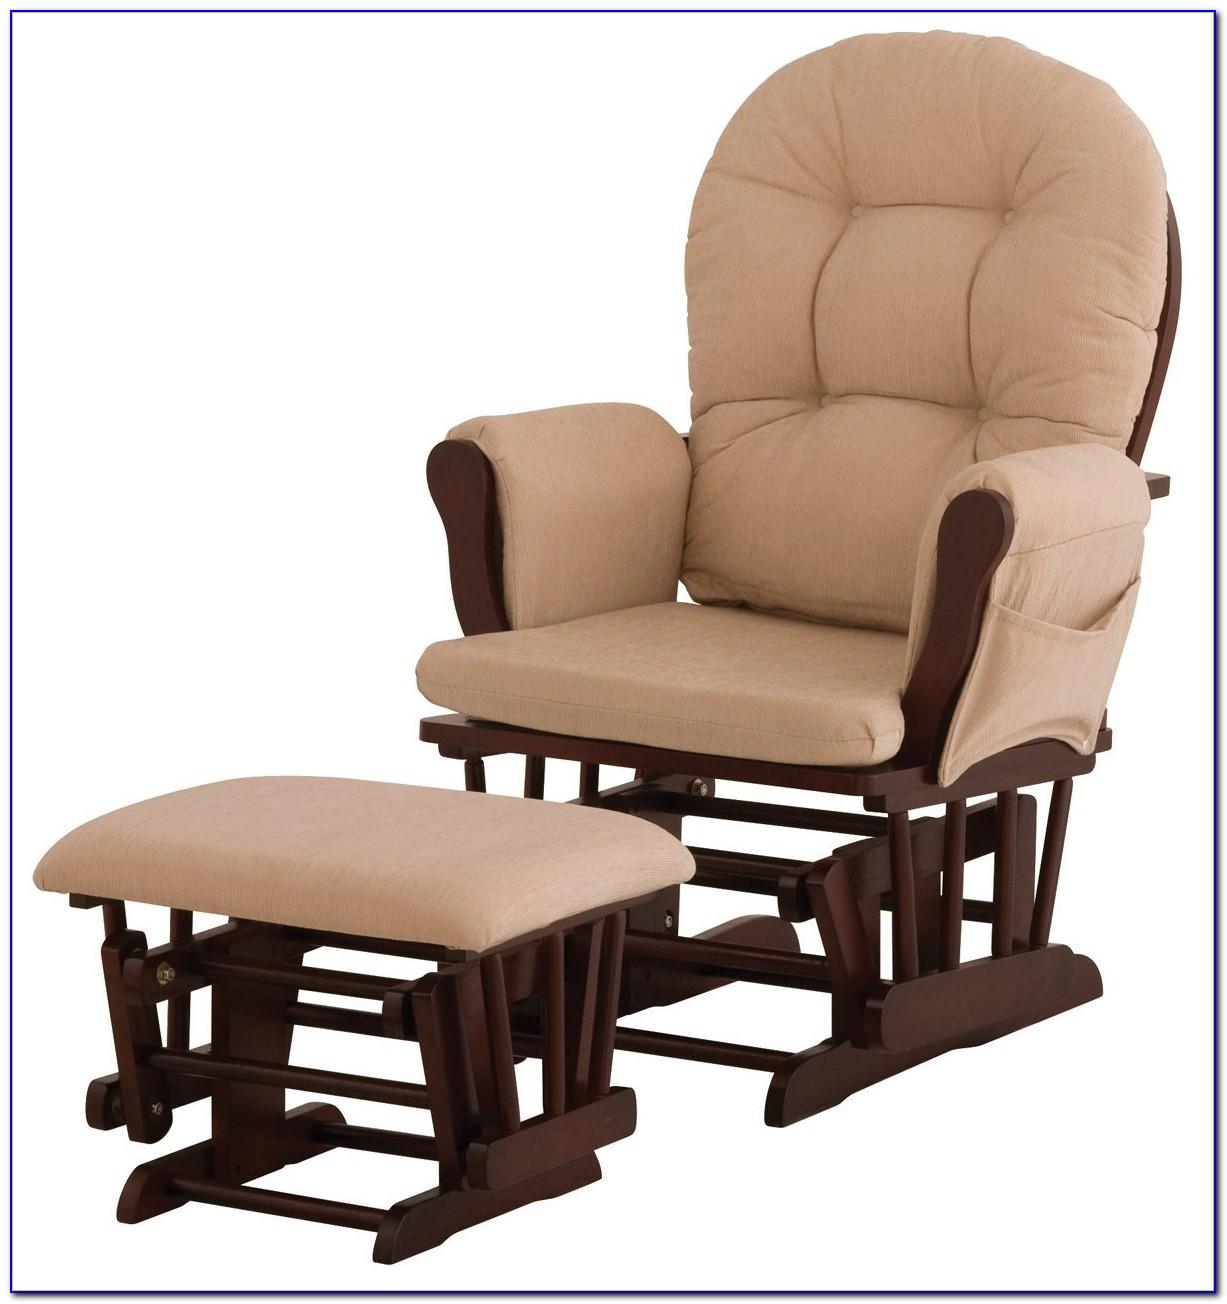 Best Rocking Chair For Nursery Australia